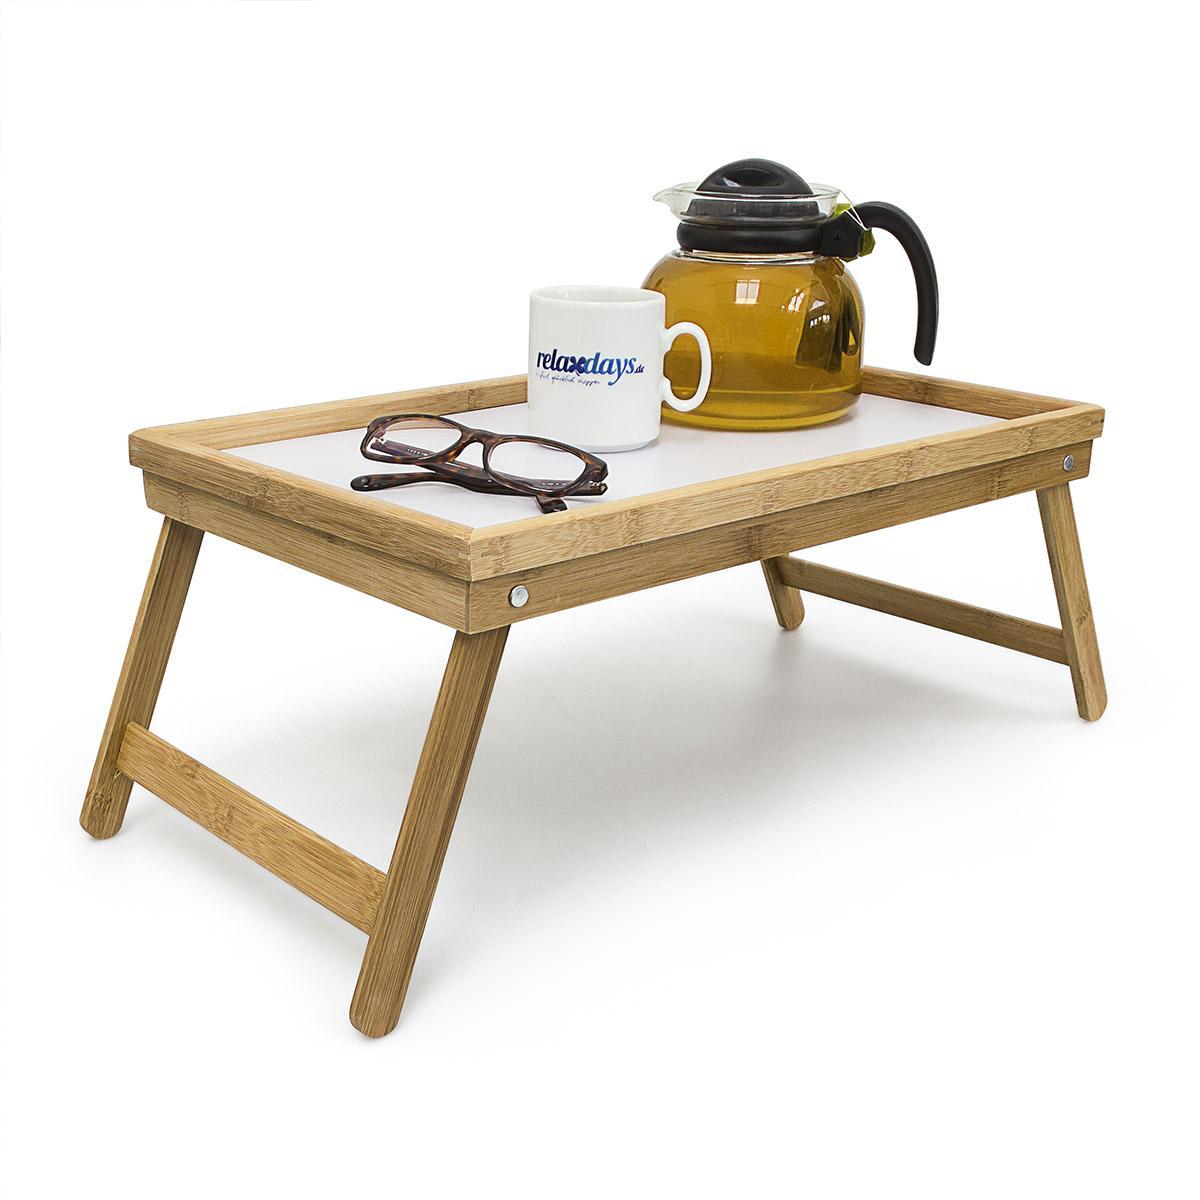 Stolík pre notebook, raňajkové stolíky - Obrázok č. 18